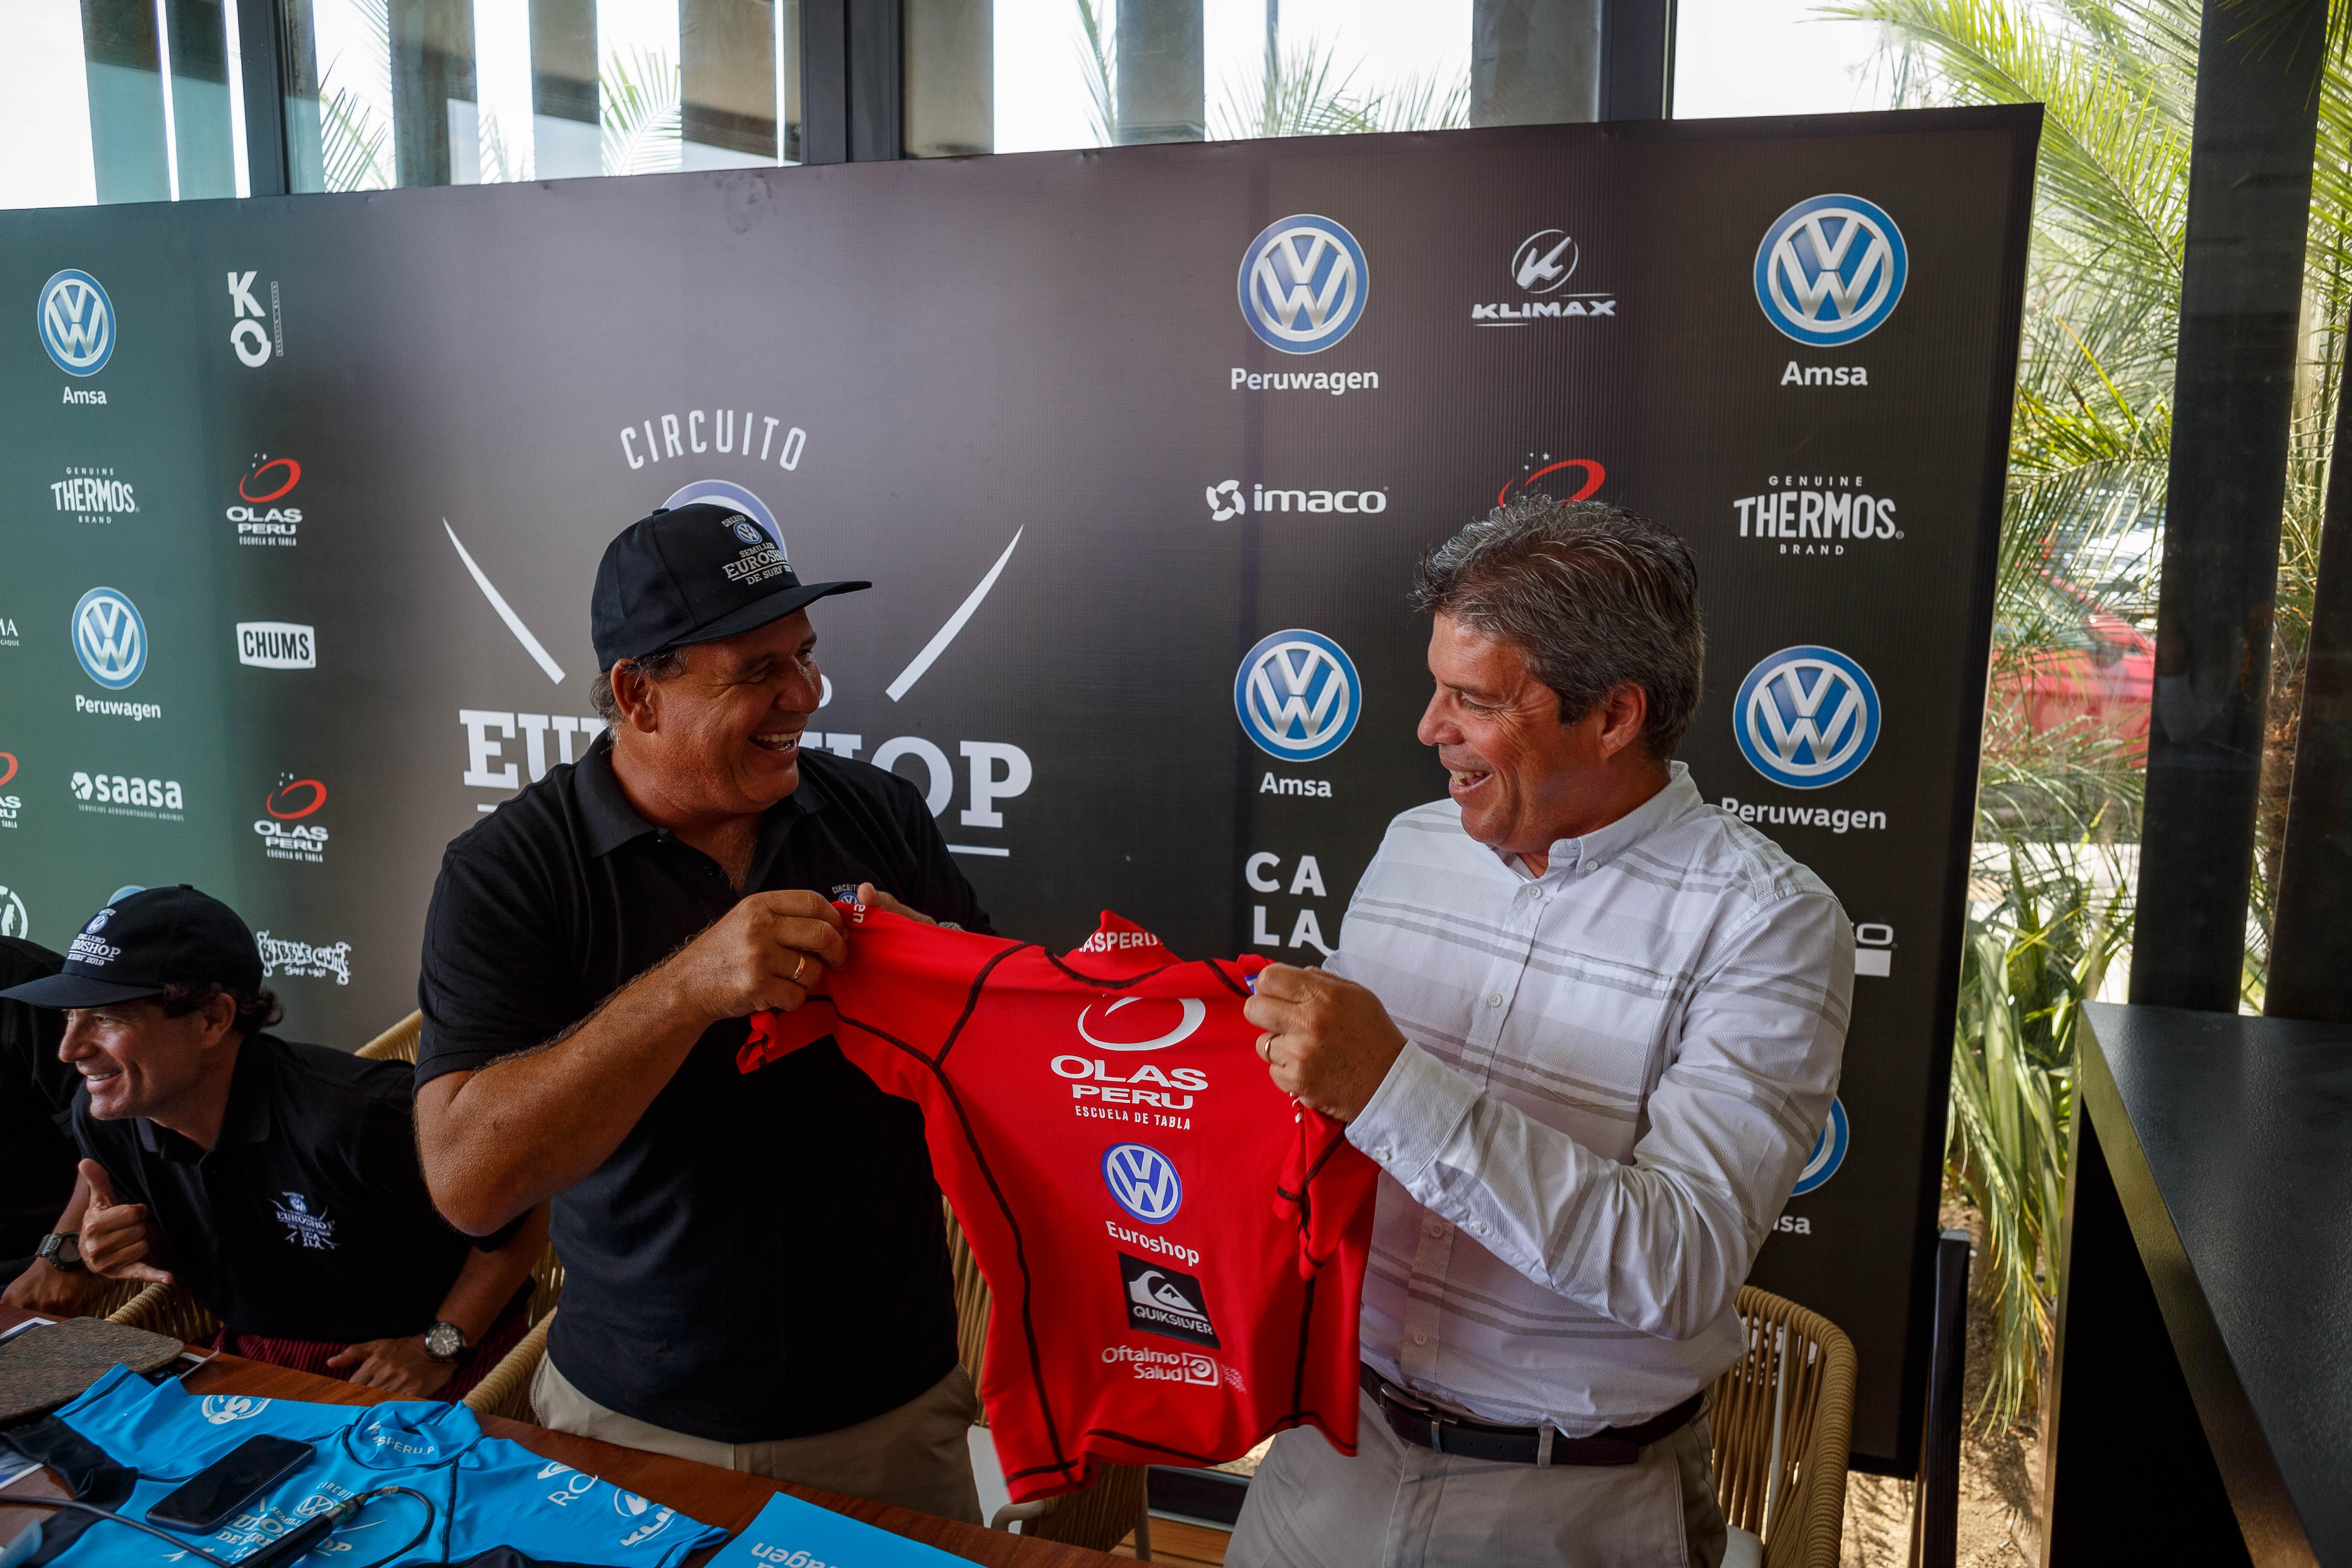 Conferencia de prensa: Circuito Semillero VW Euroshop de Surf 2019